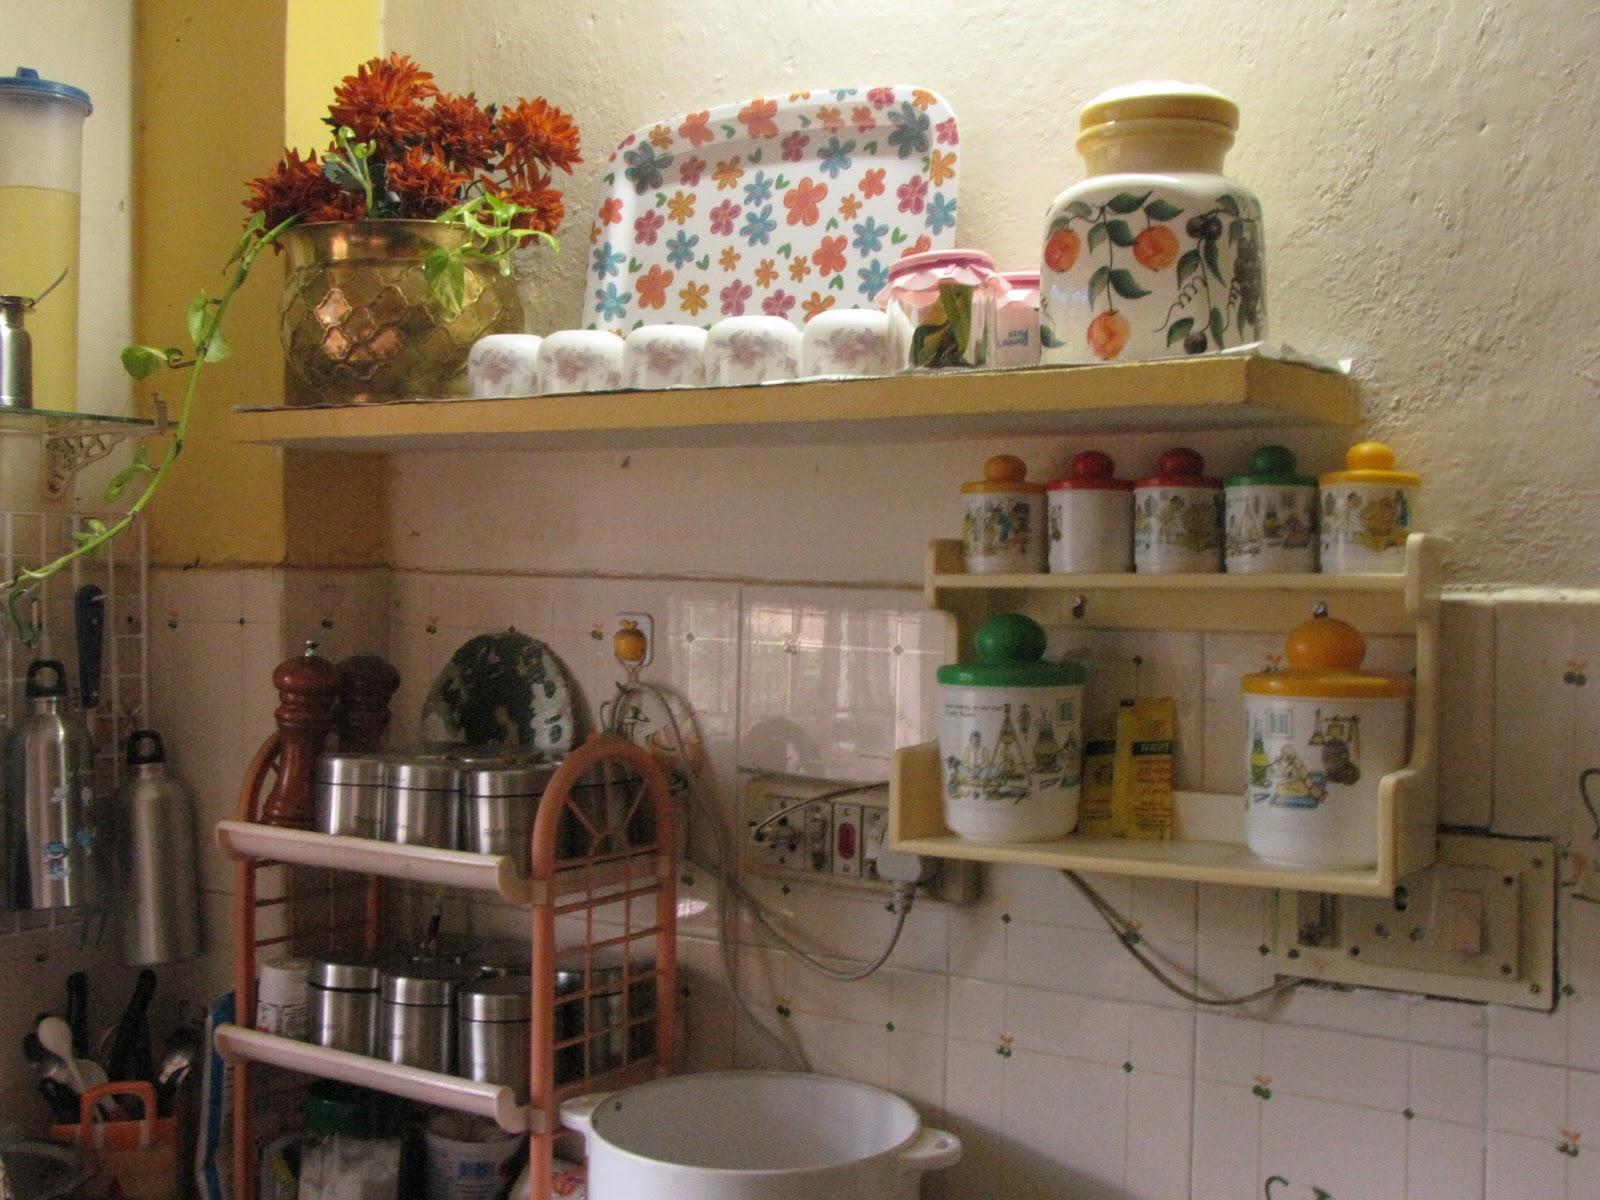 Avial n Rasam Hearth and Home Vidyas Kool Kitchen